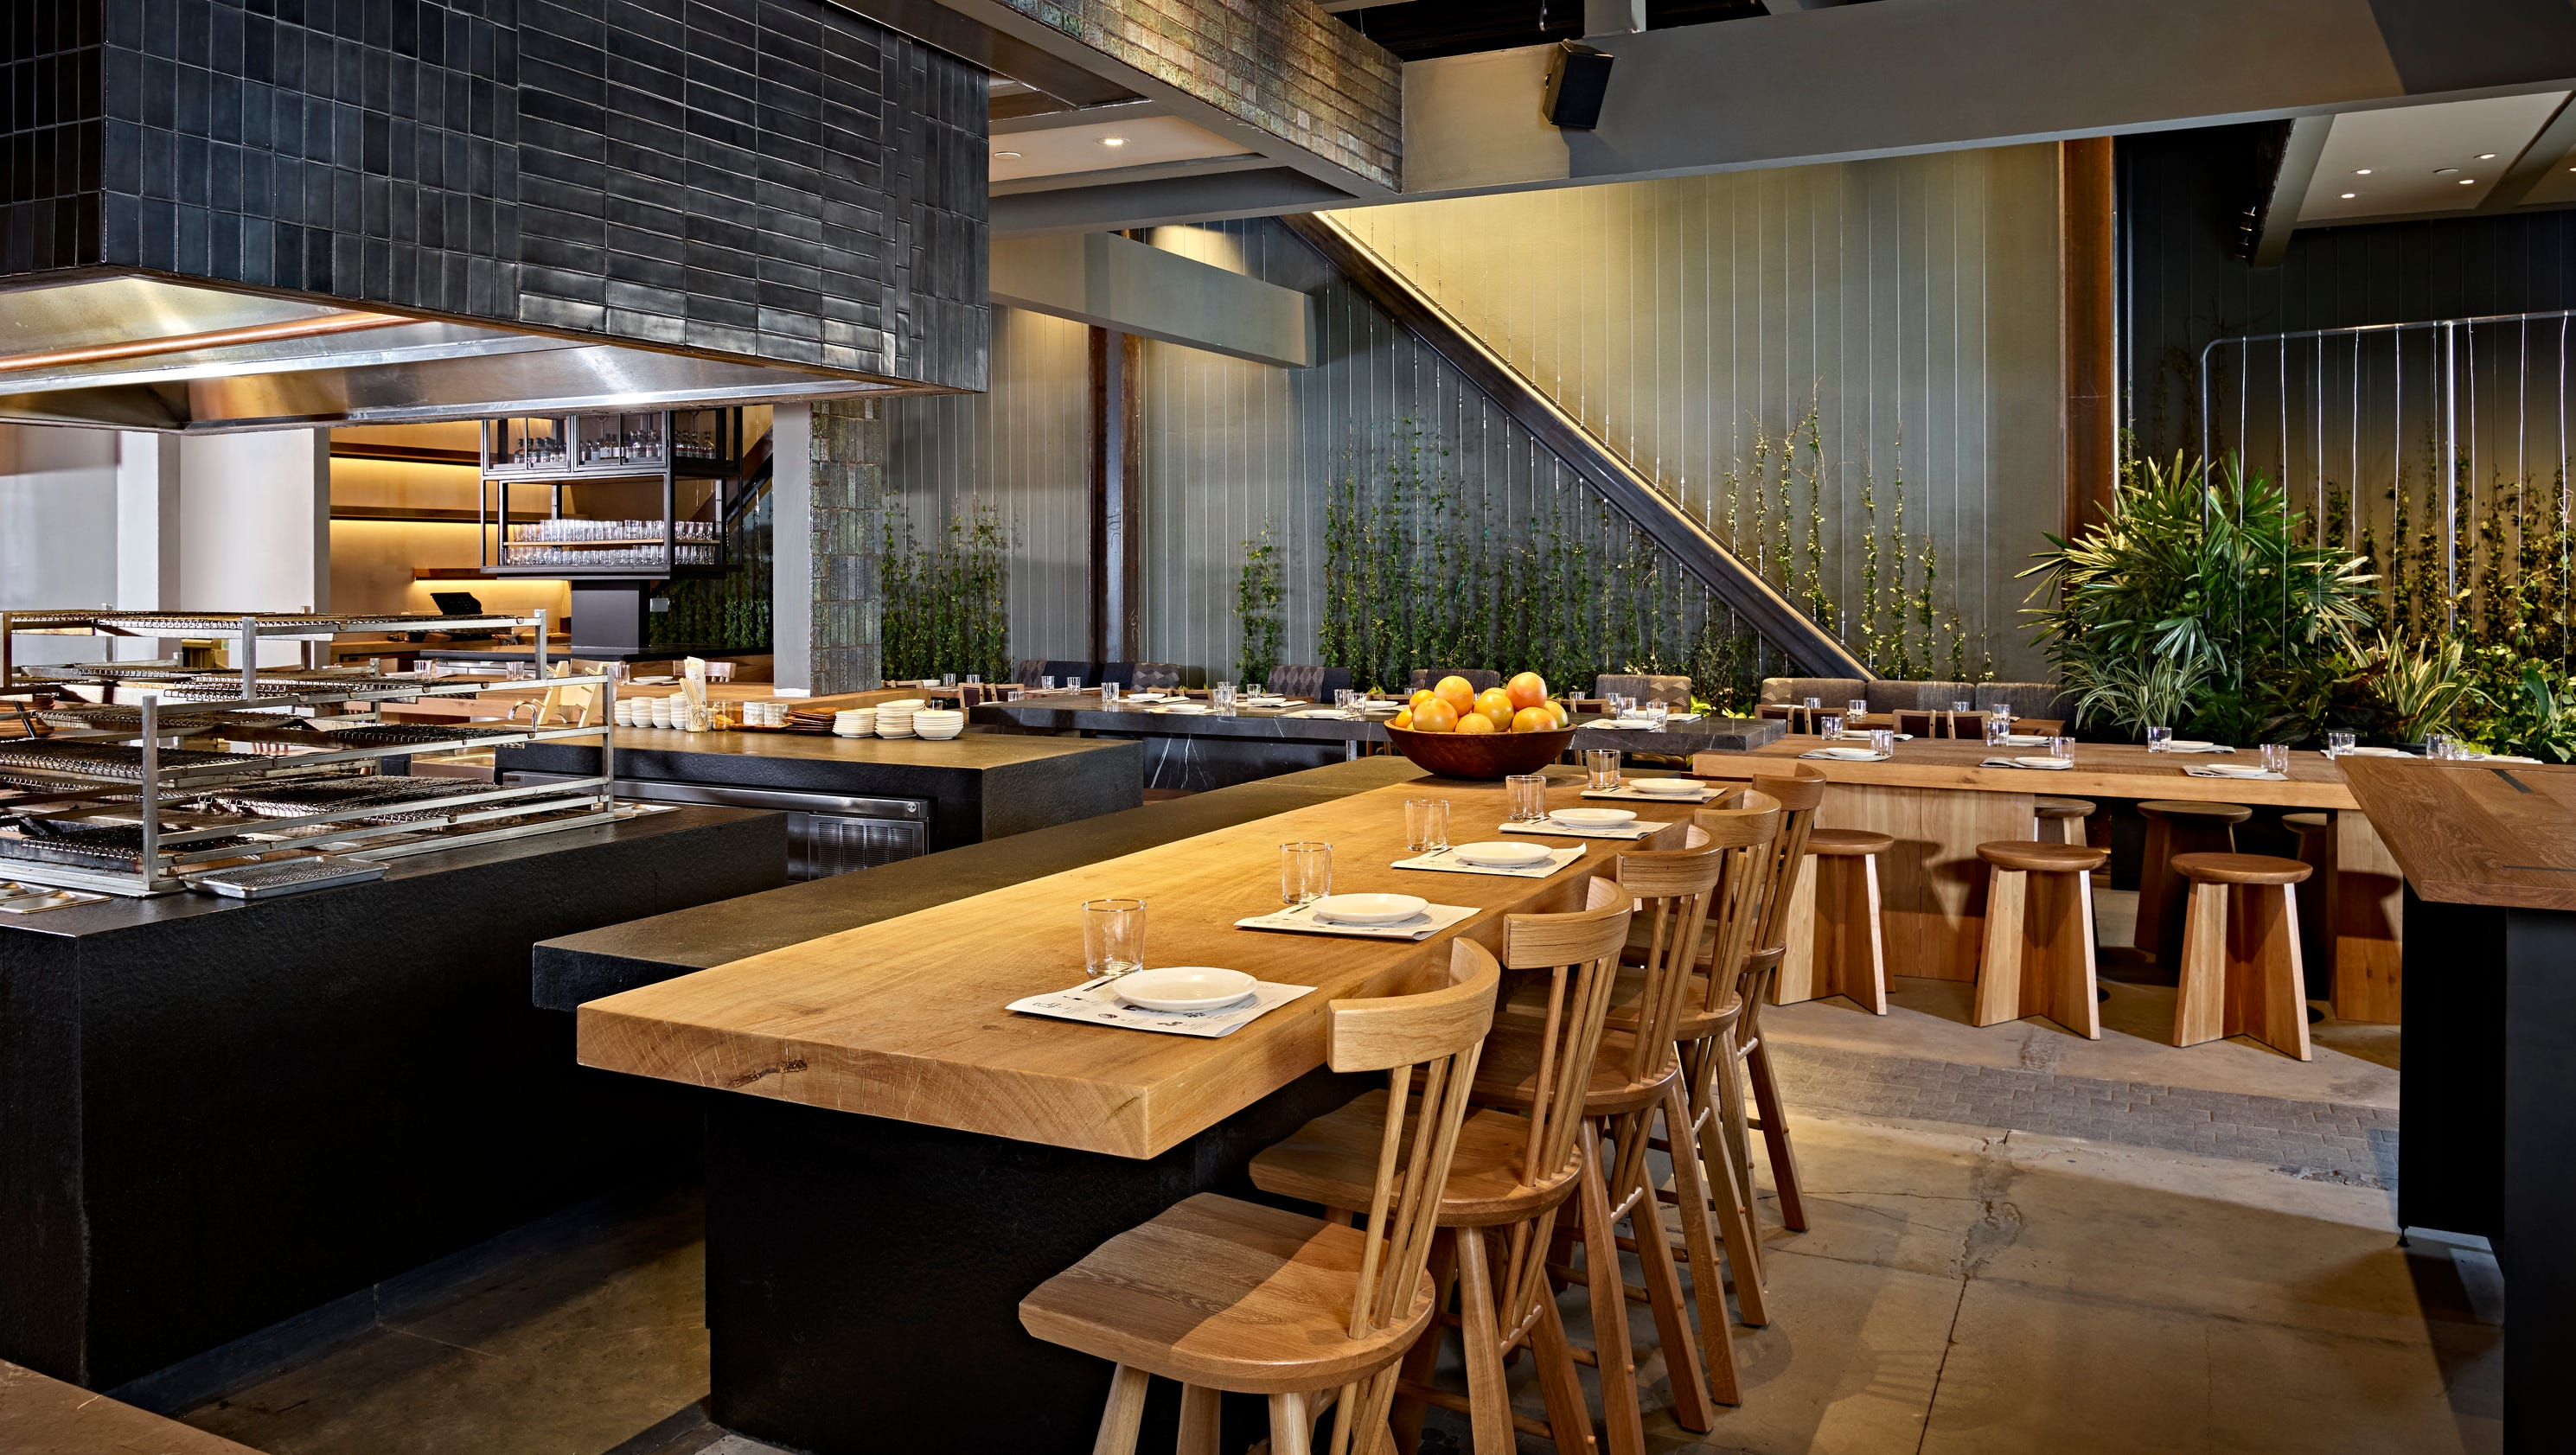 Restaurants, bars, breweries opening in 2018